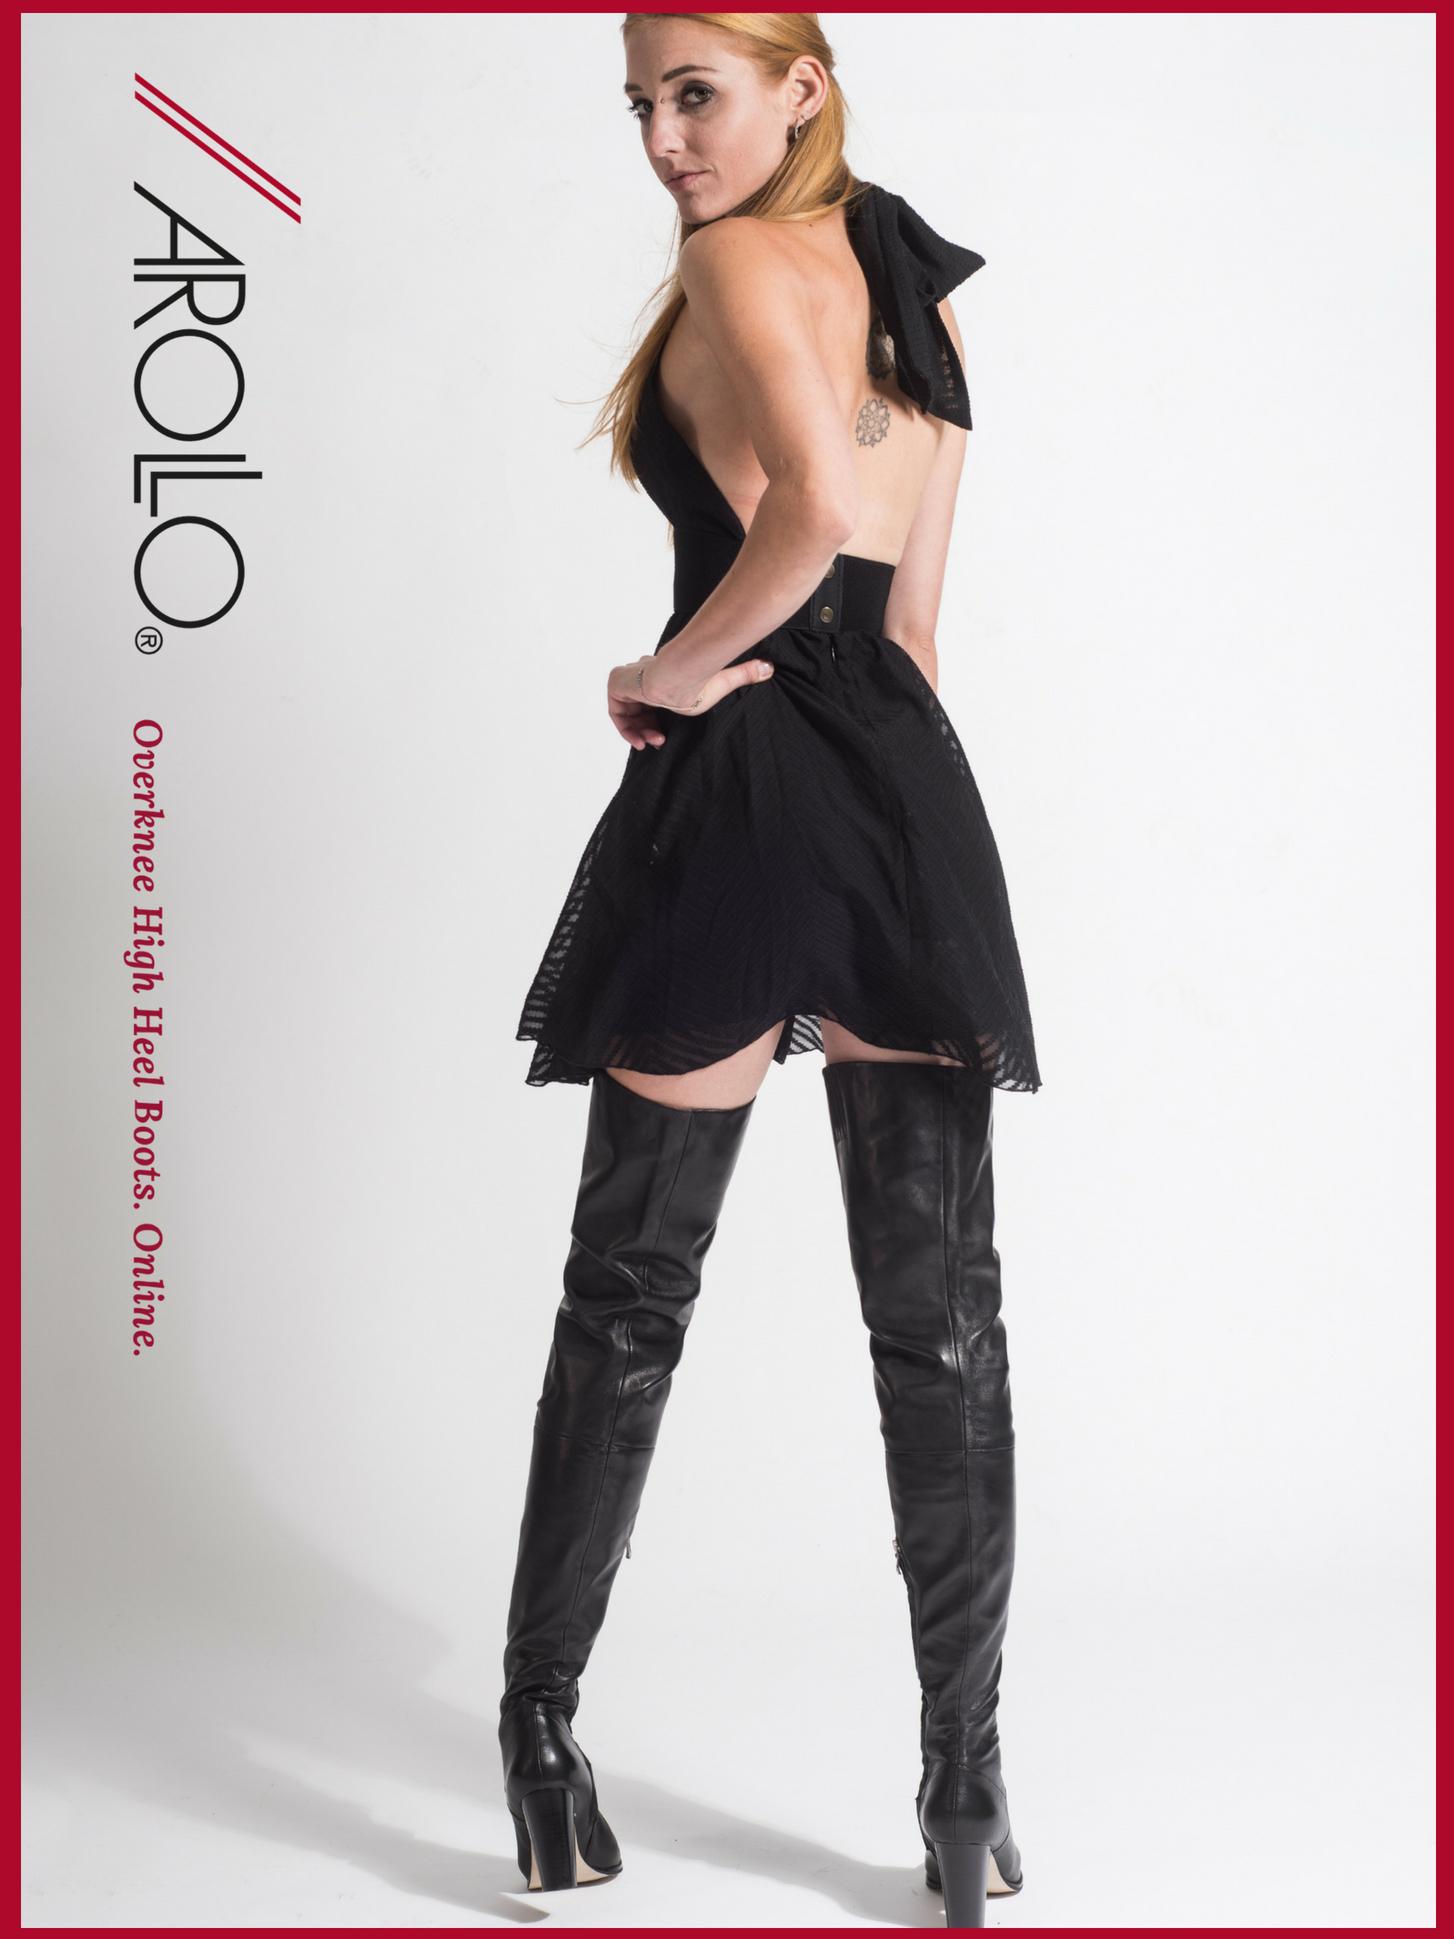 Thigh High Boots Victoria